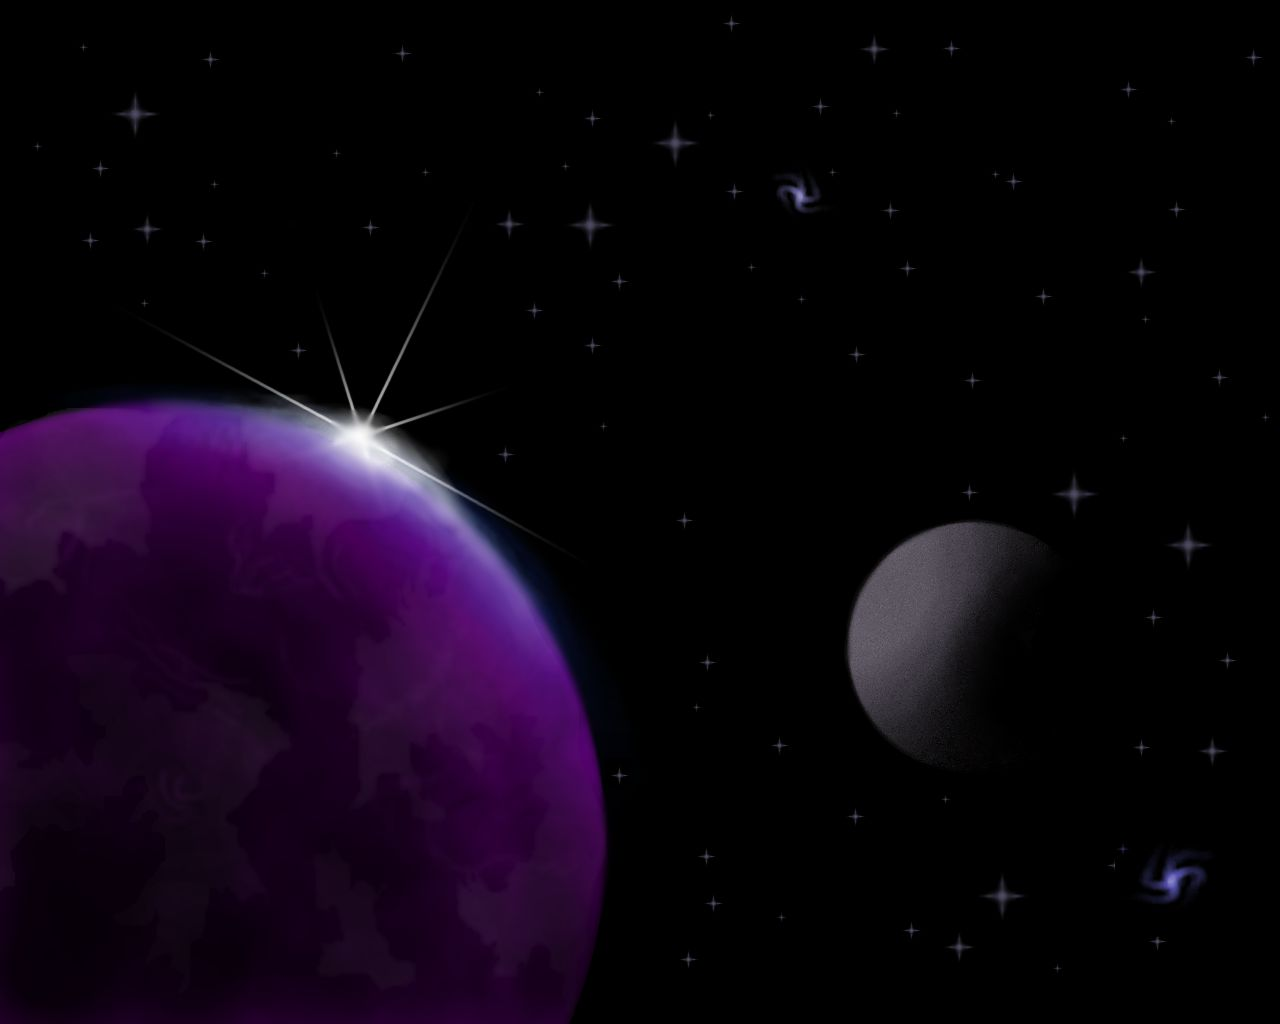 Tapeta purpurova_planeta